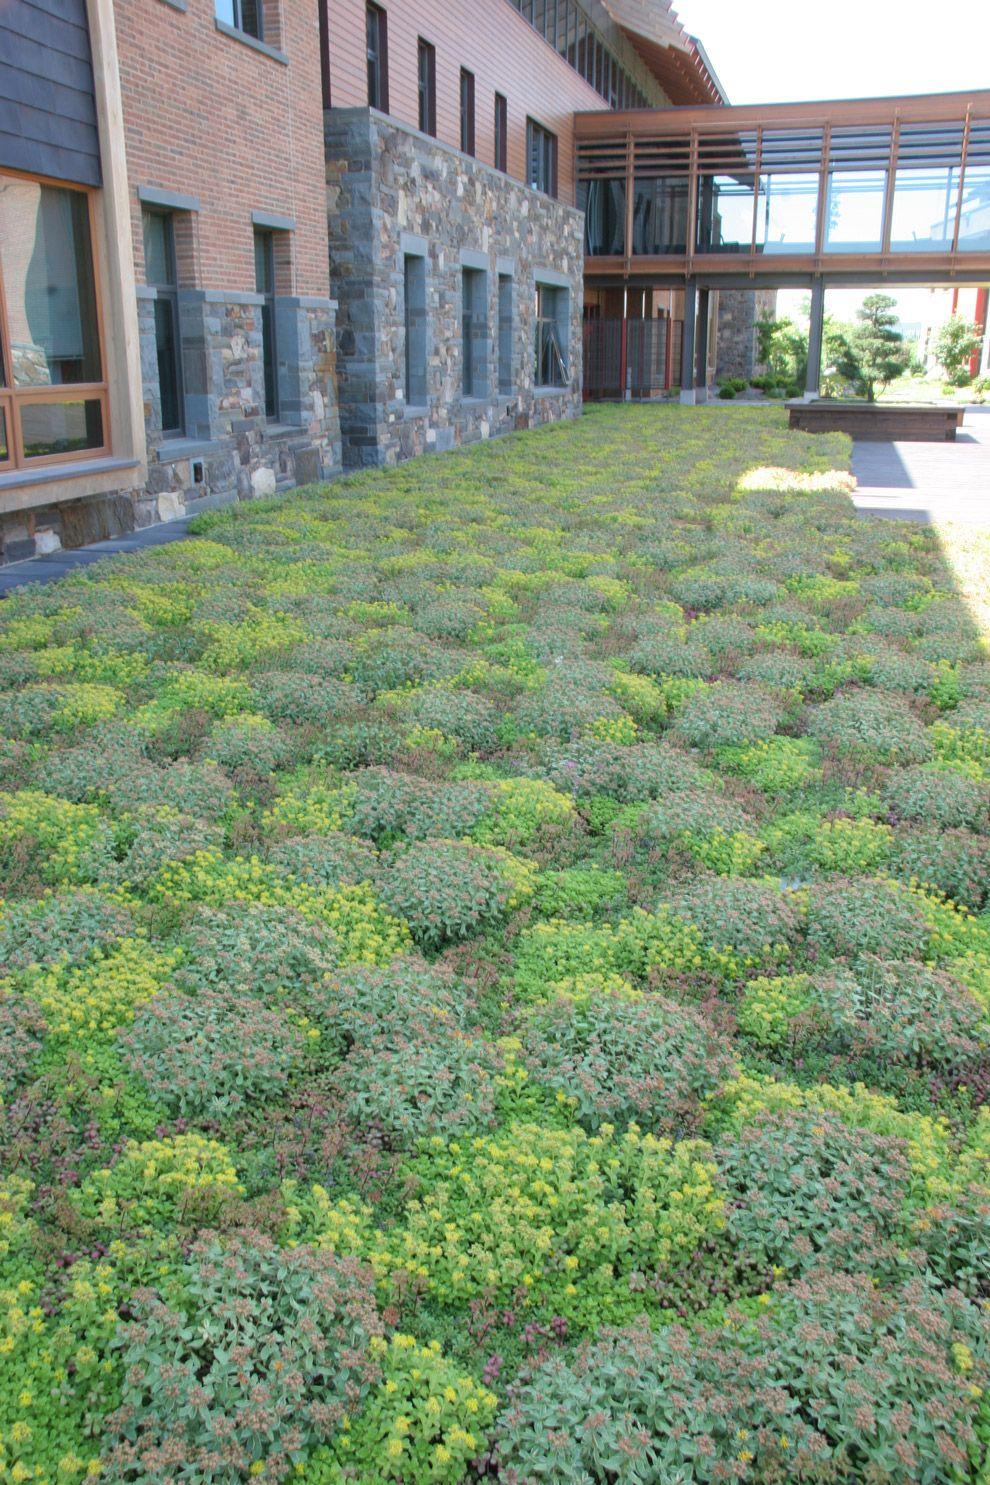 58b09cfda09f62f37c988ba8619632df - The House Of Gardening & Hydroponics Madison Heights